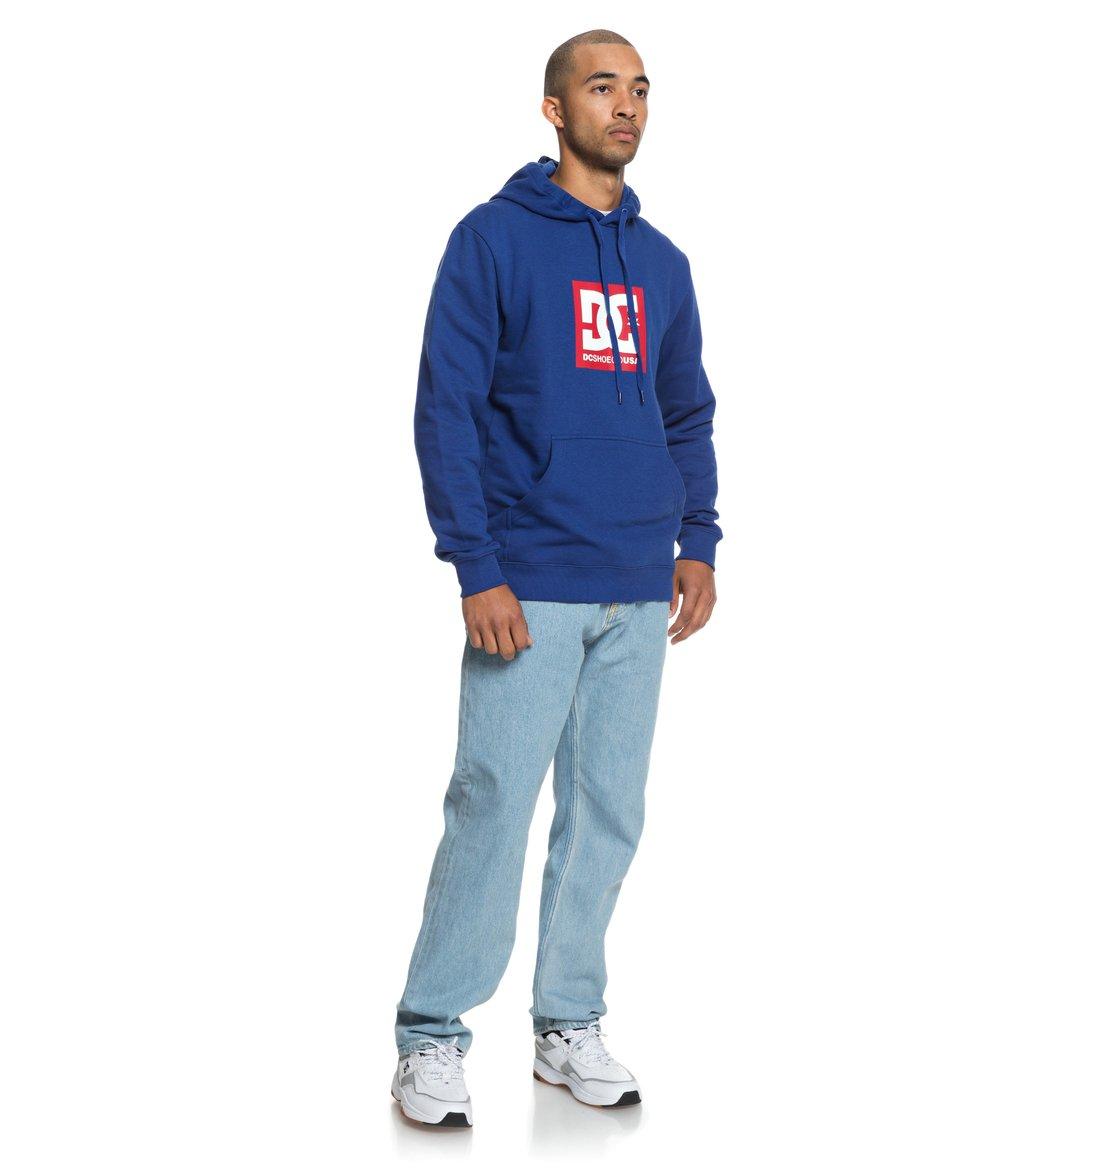 Hoodie Square Dc Shoes Star Edysf03167 ™ PqnTgnvI